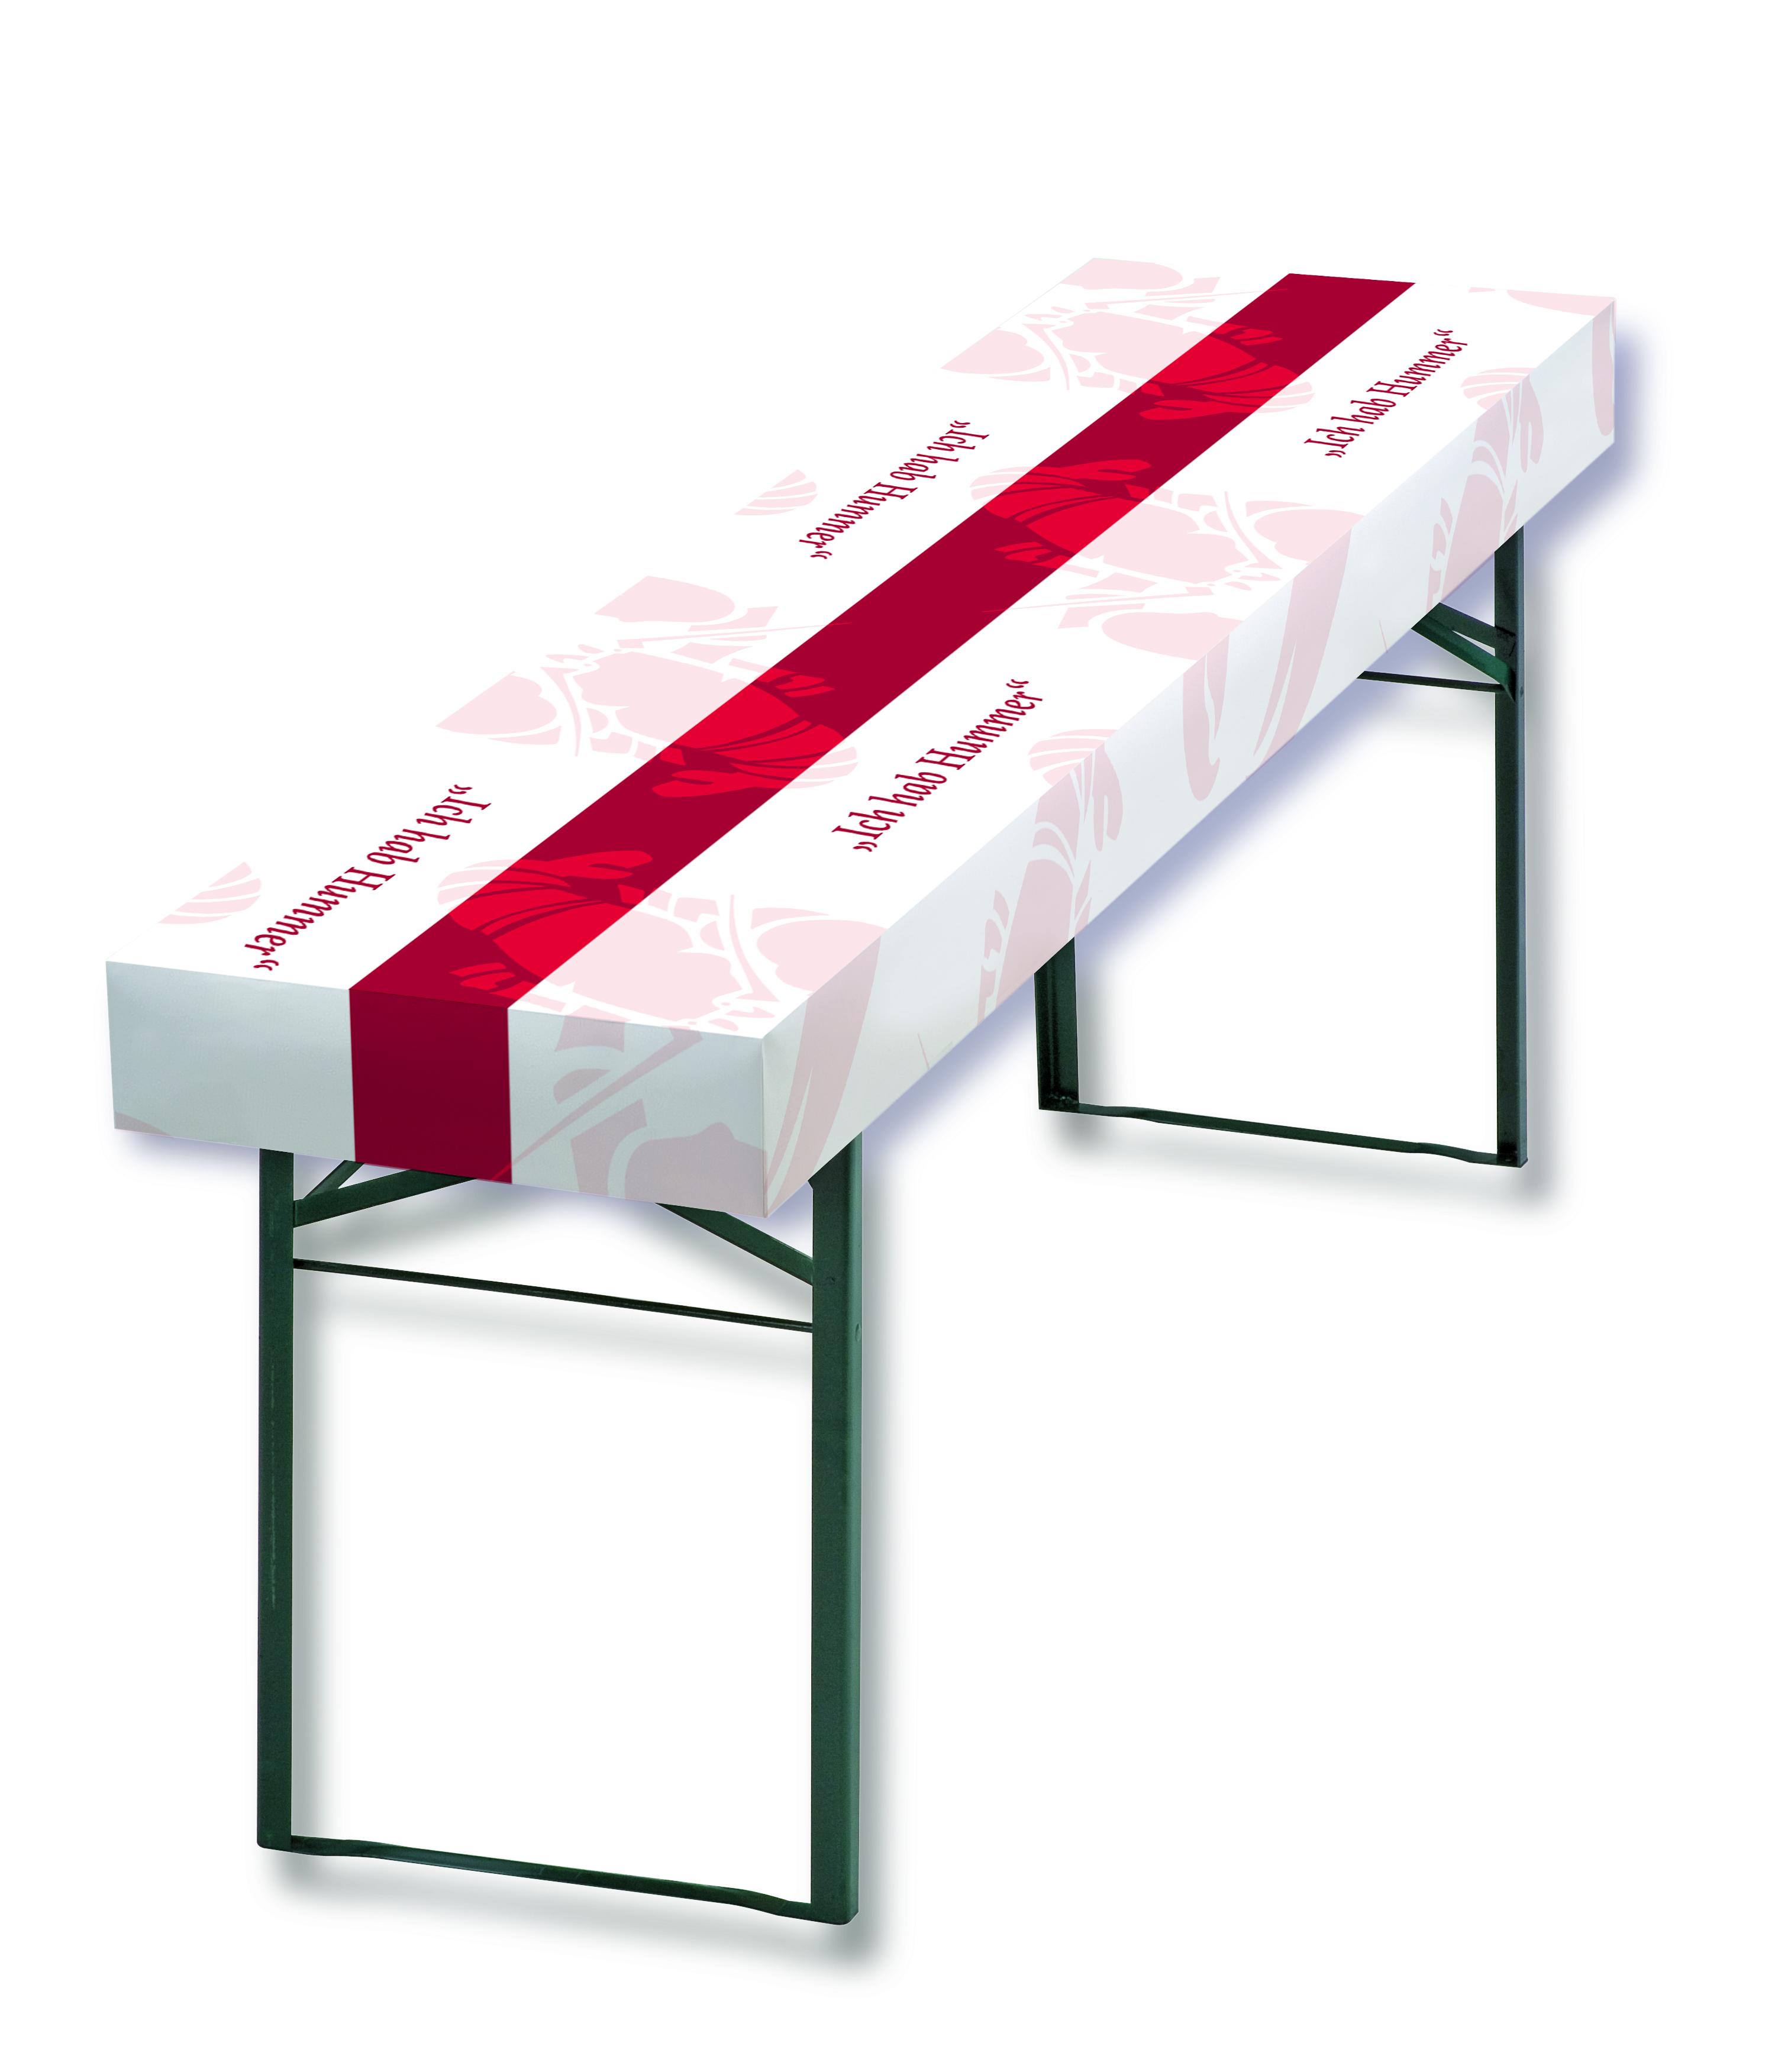 Tischdecke, bedruckt, individuell, Logo, Motto, Thema, Papier, wasserfest